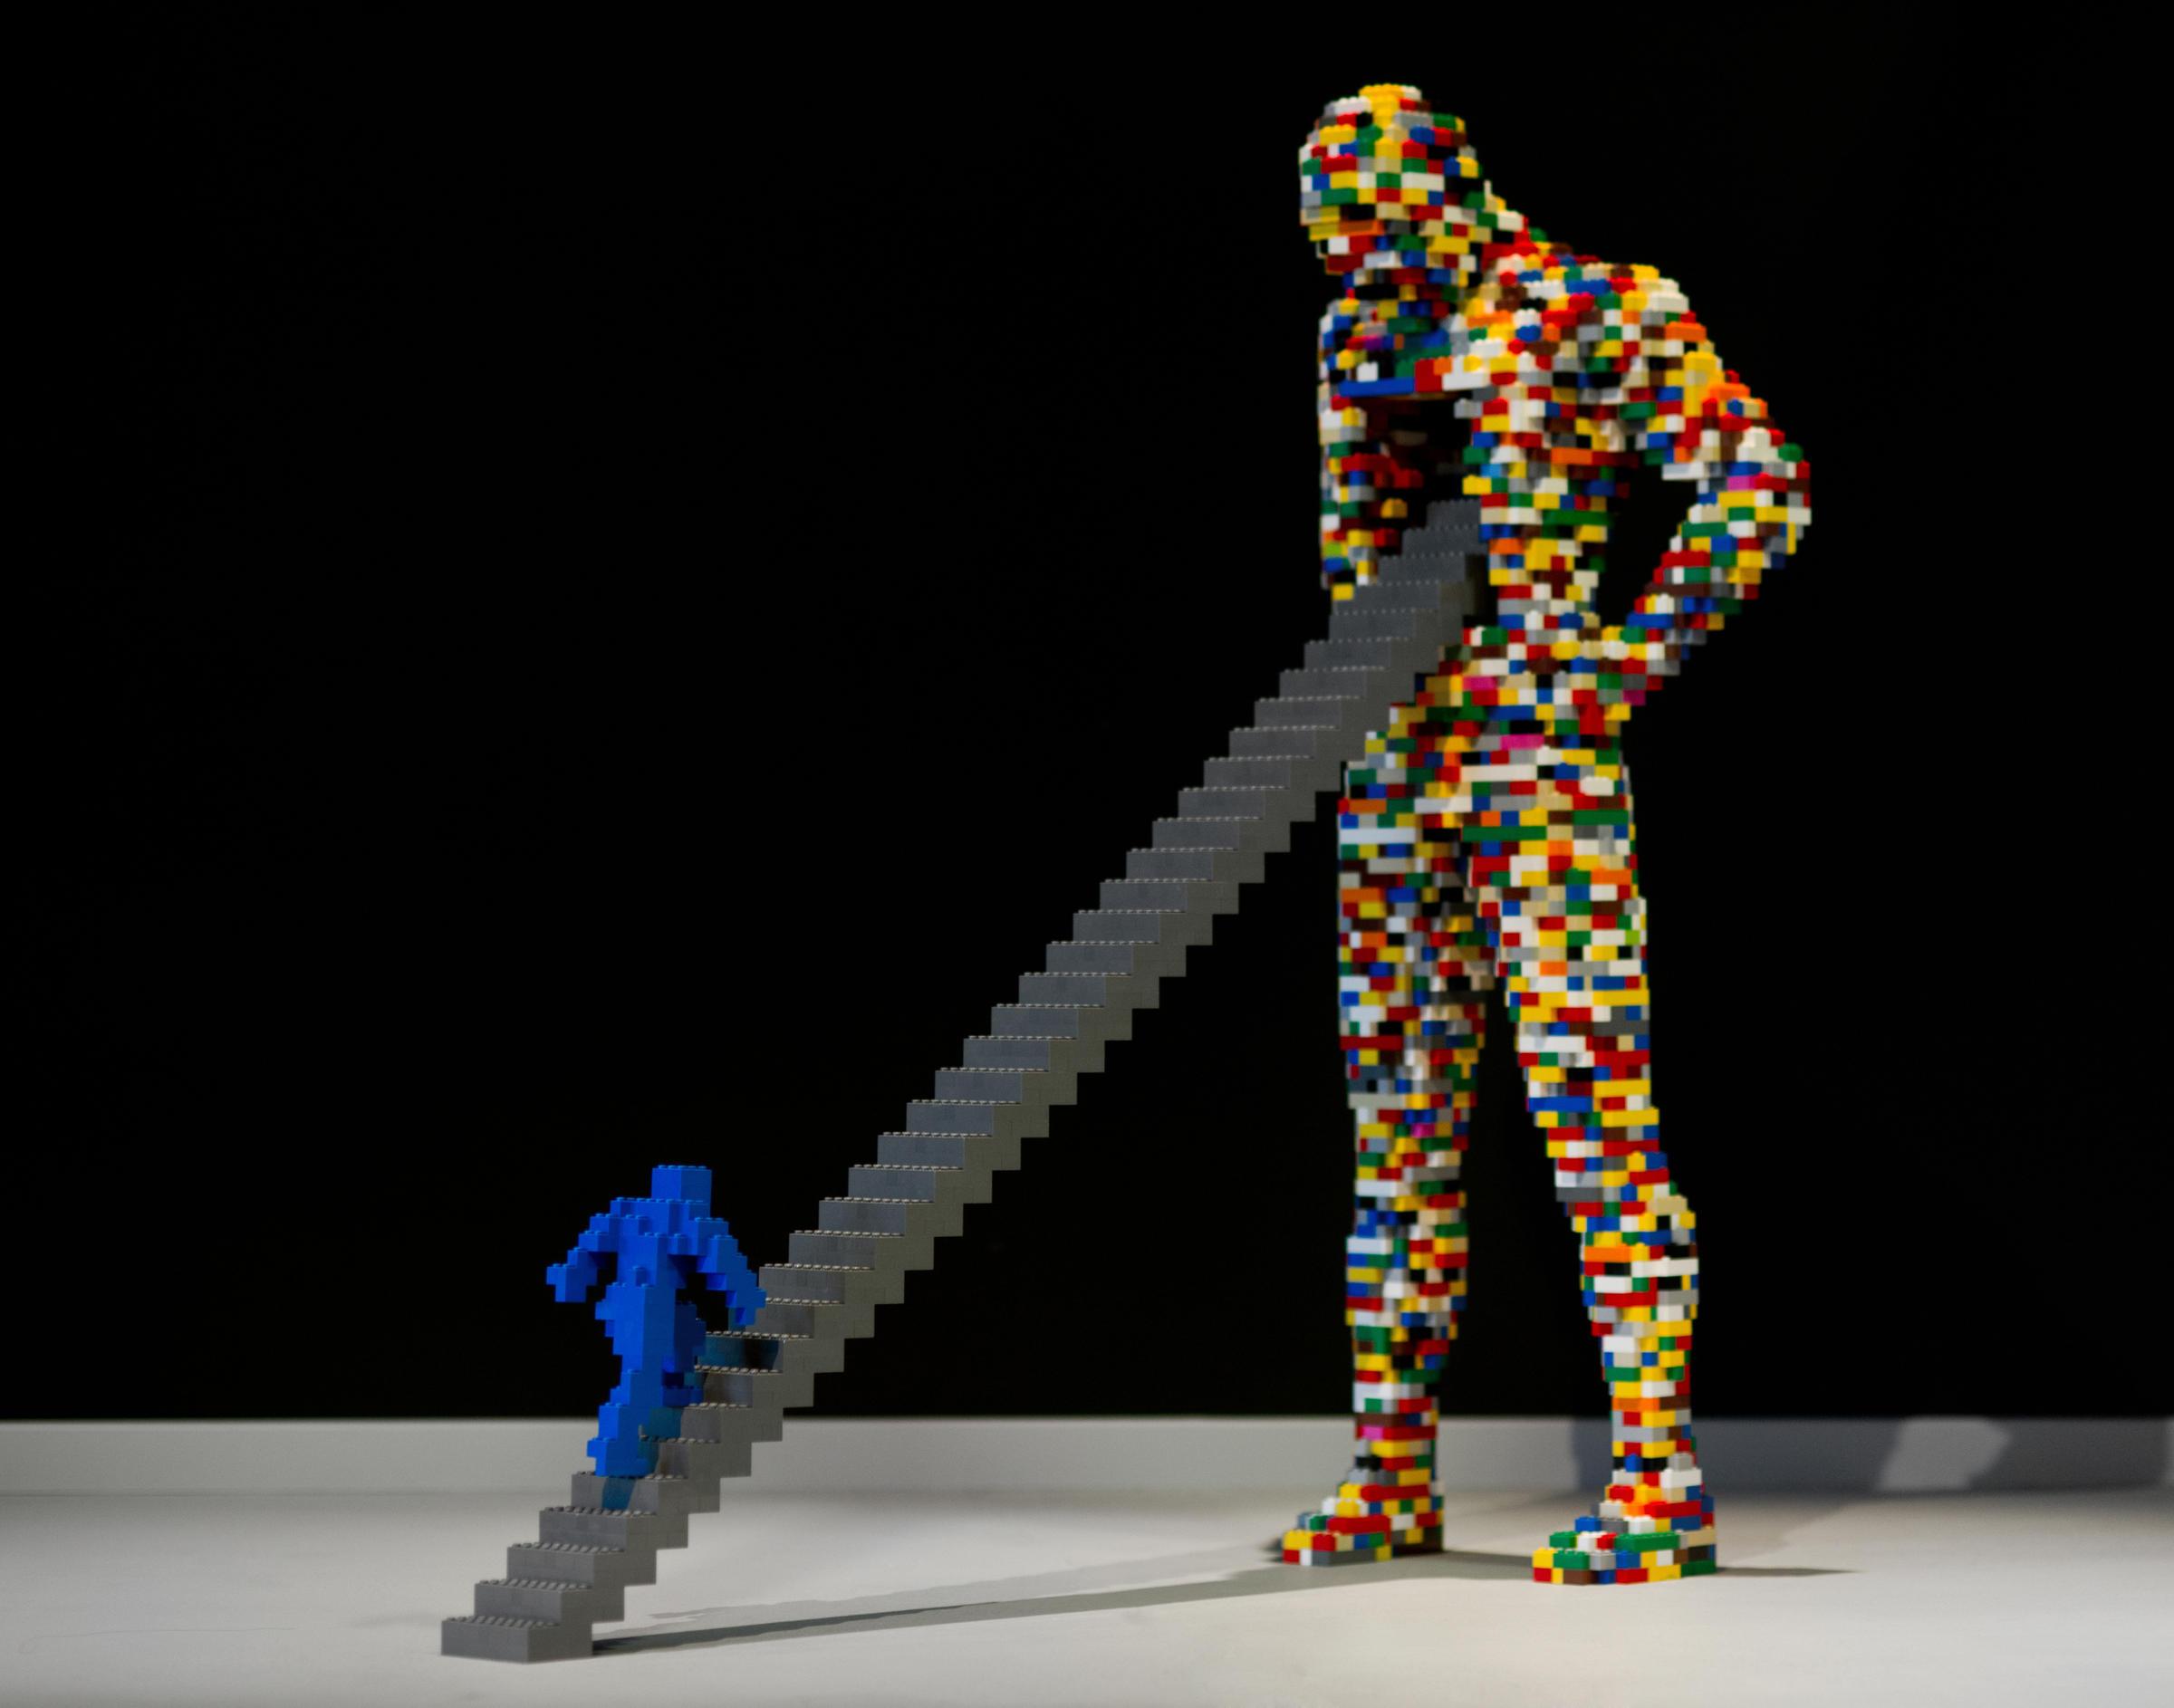 Global Tour Of Nathan Sawaya S Lego Sculptures In Myrtle Beach Until September